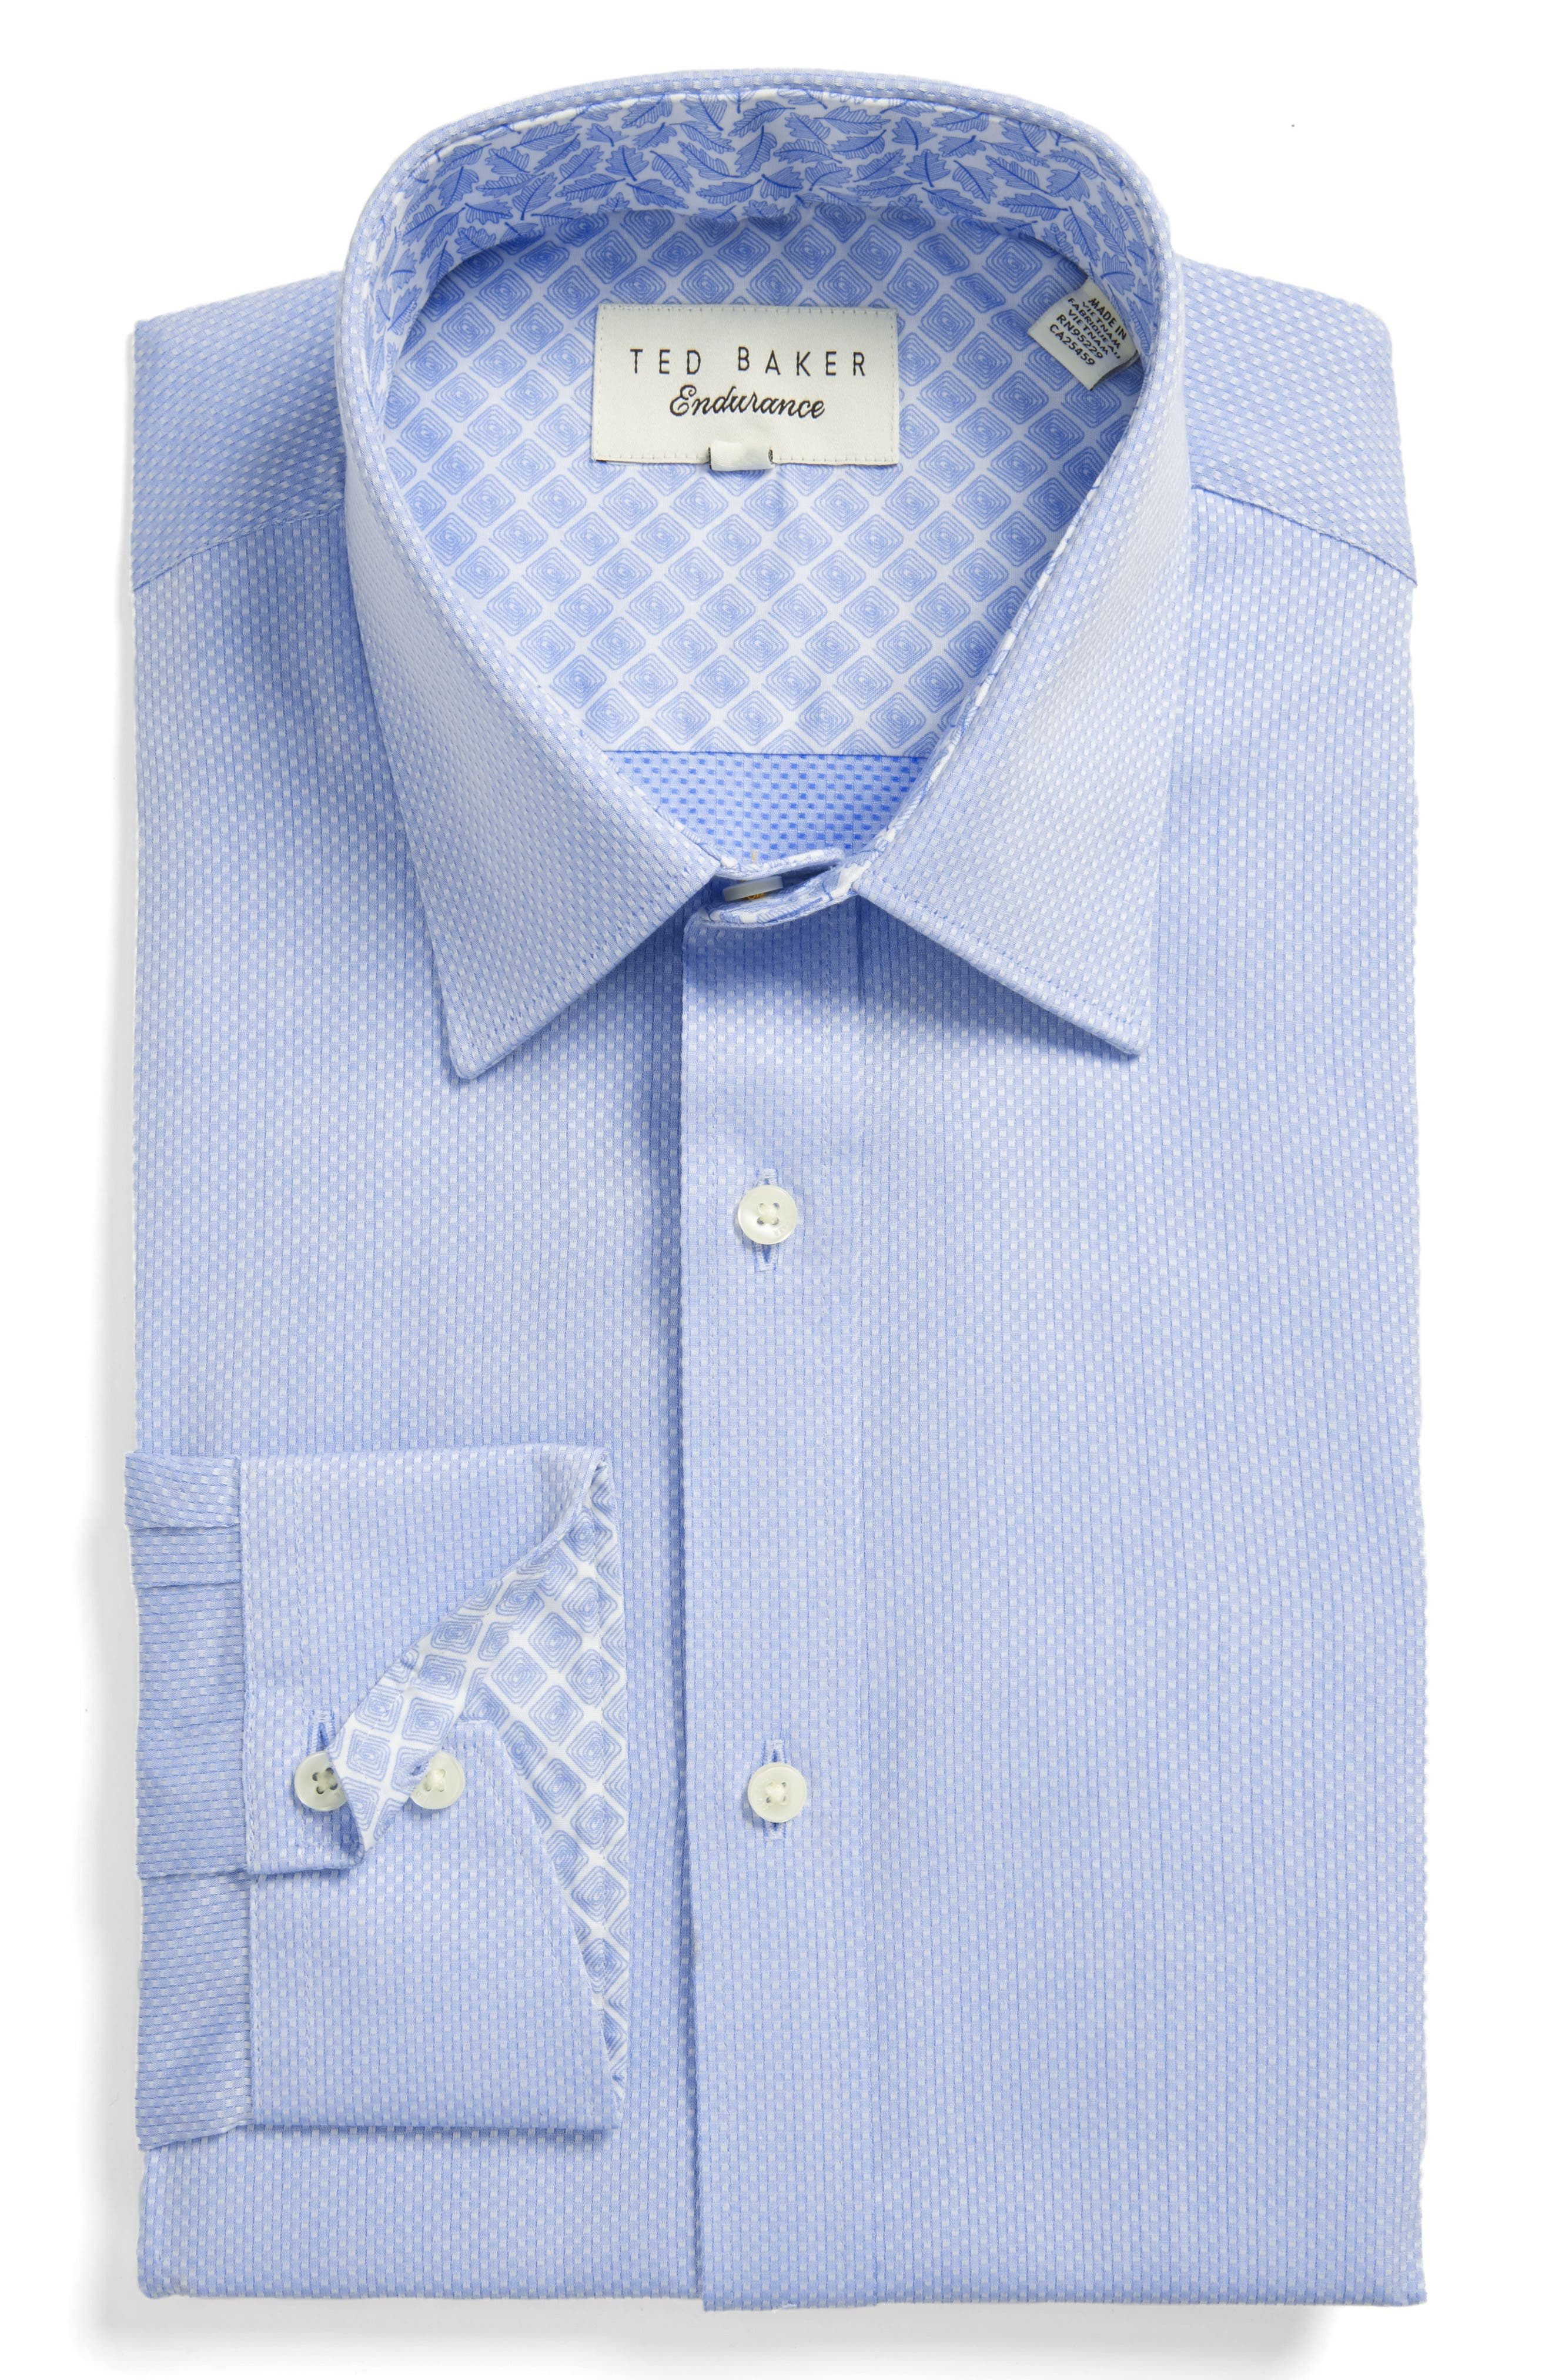 Endurance Trim Fit Dress Shirt,                             Main thumbnail 1, color,                             Blue